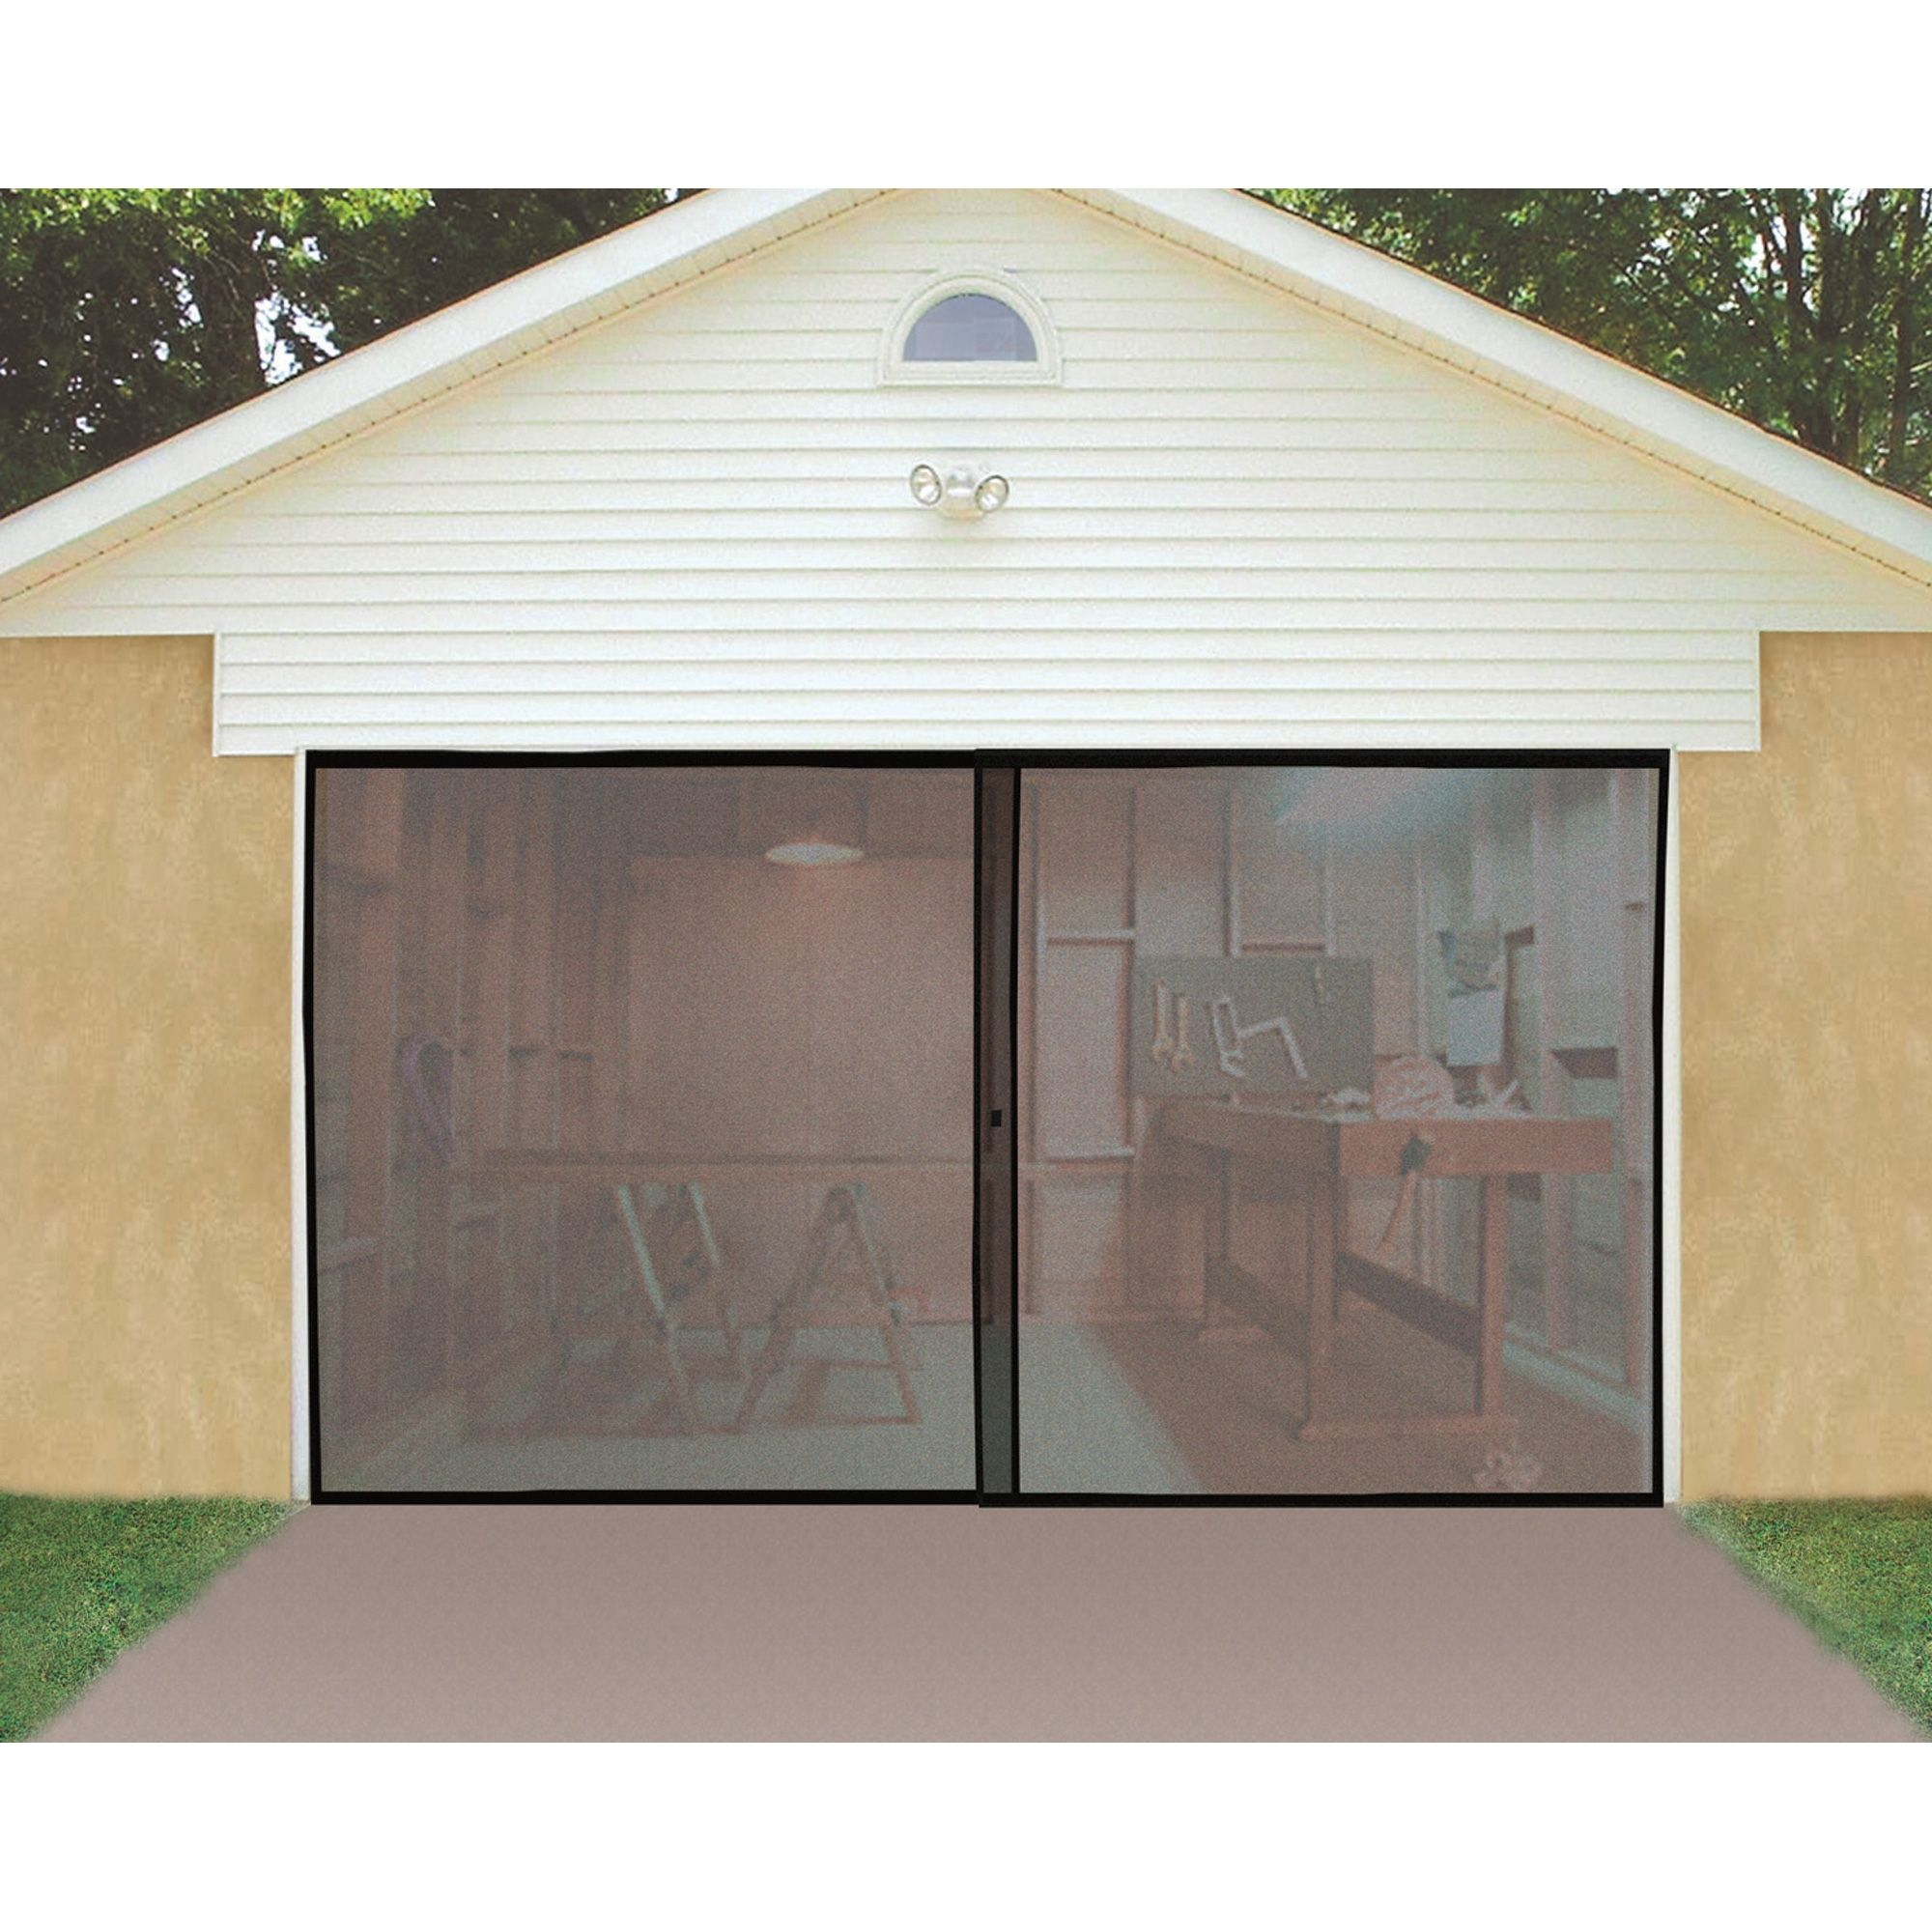 windows enclosure beautiful with of doors full size garage screen womenofpowerfo door